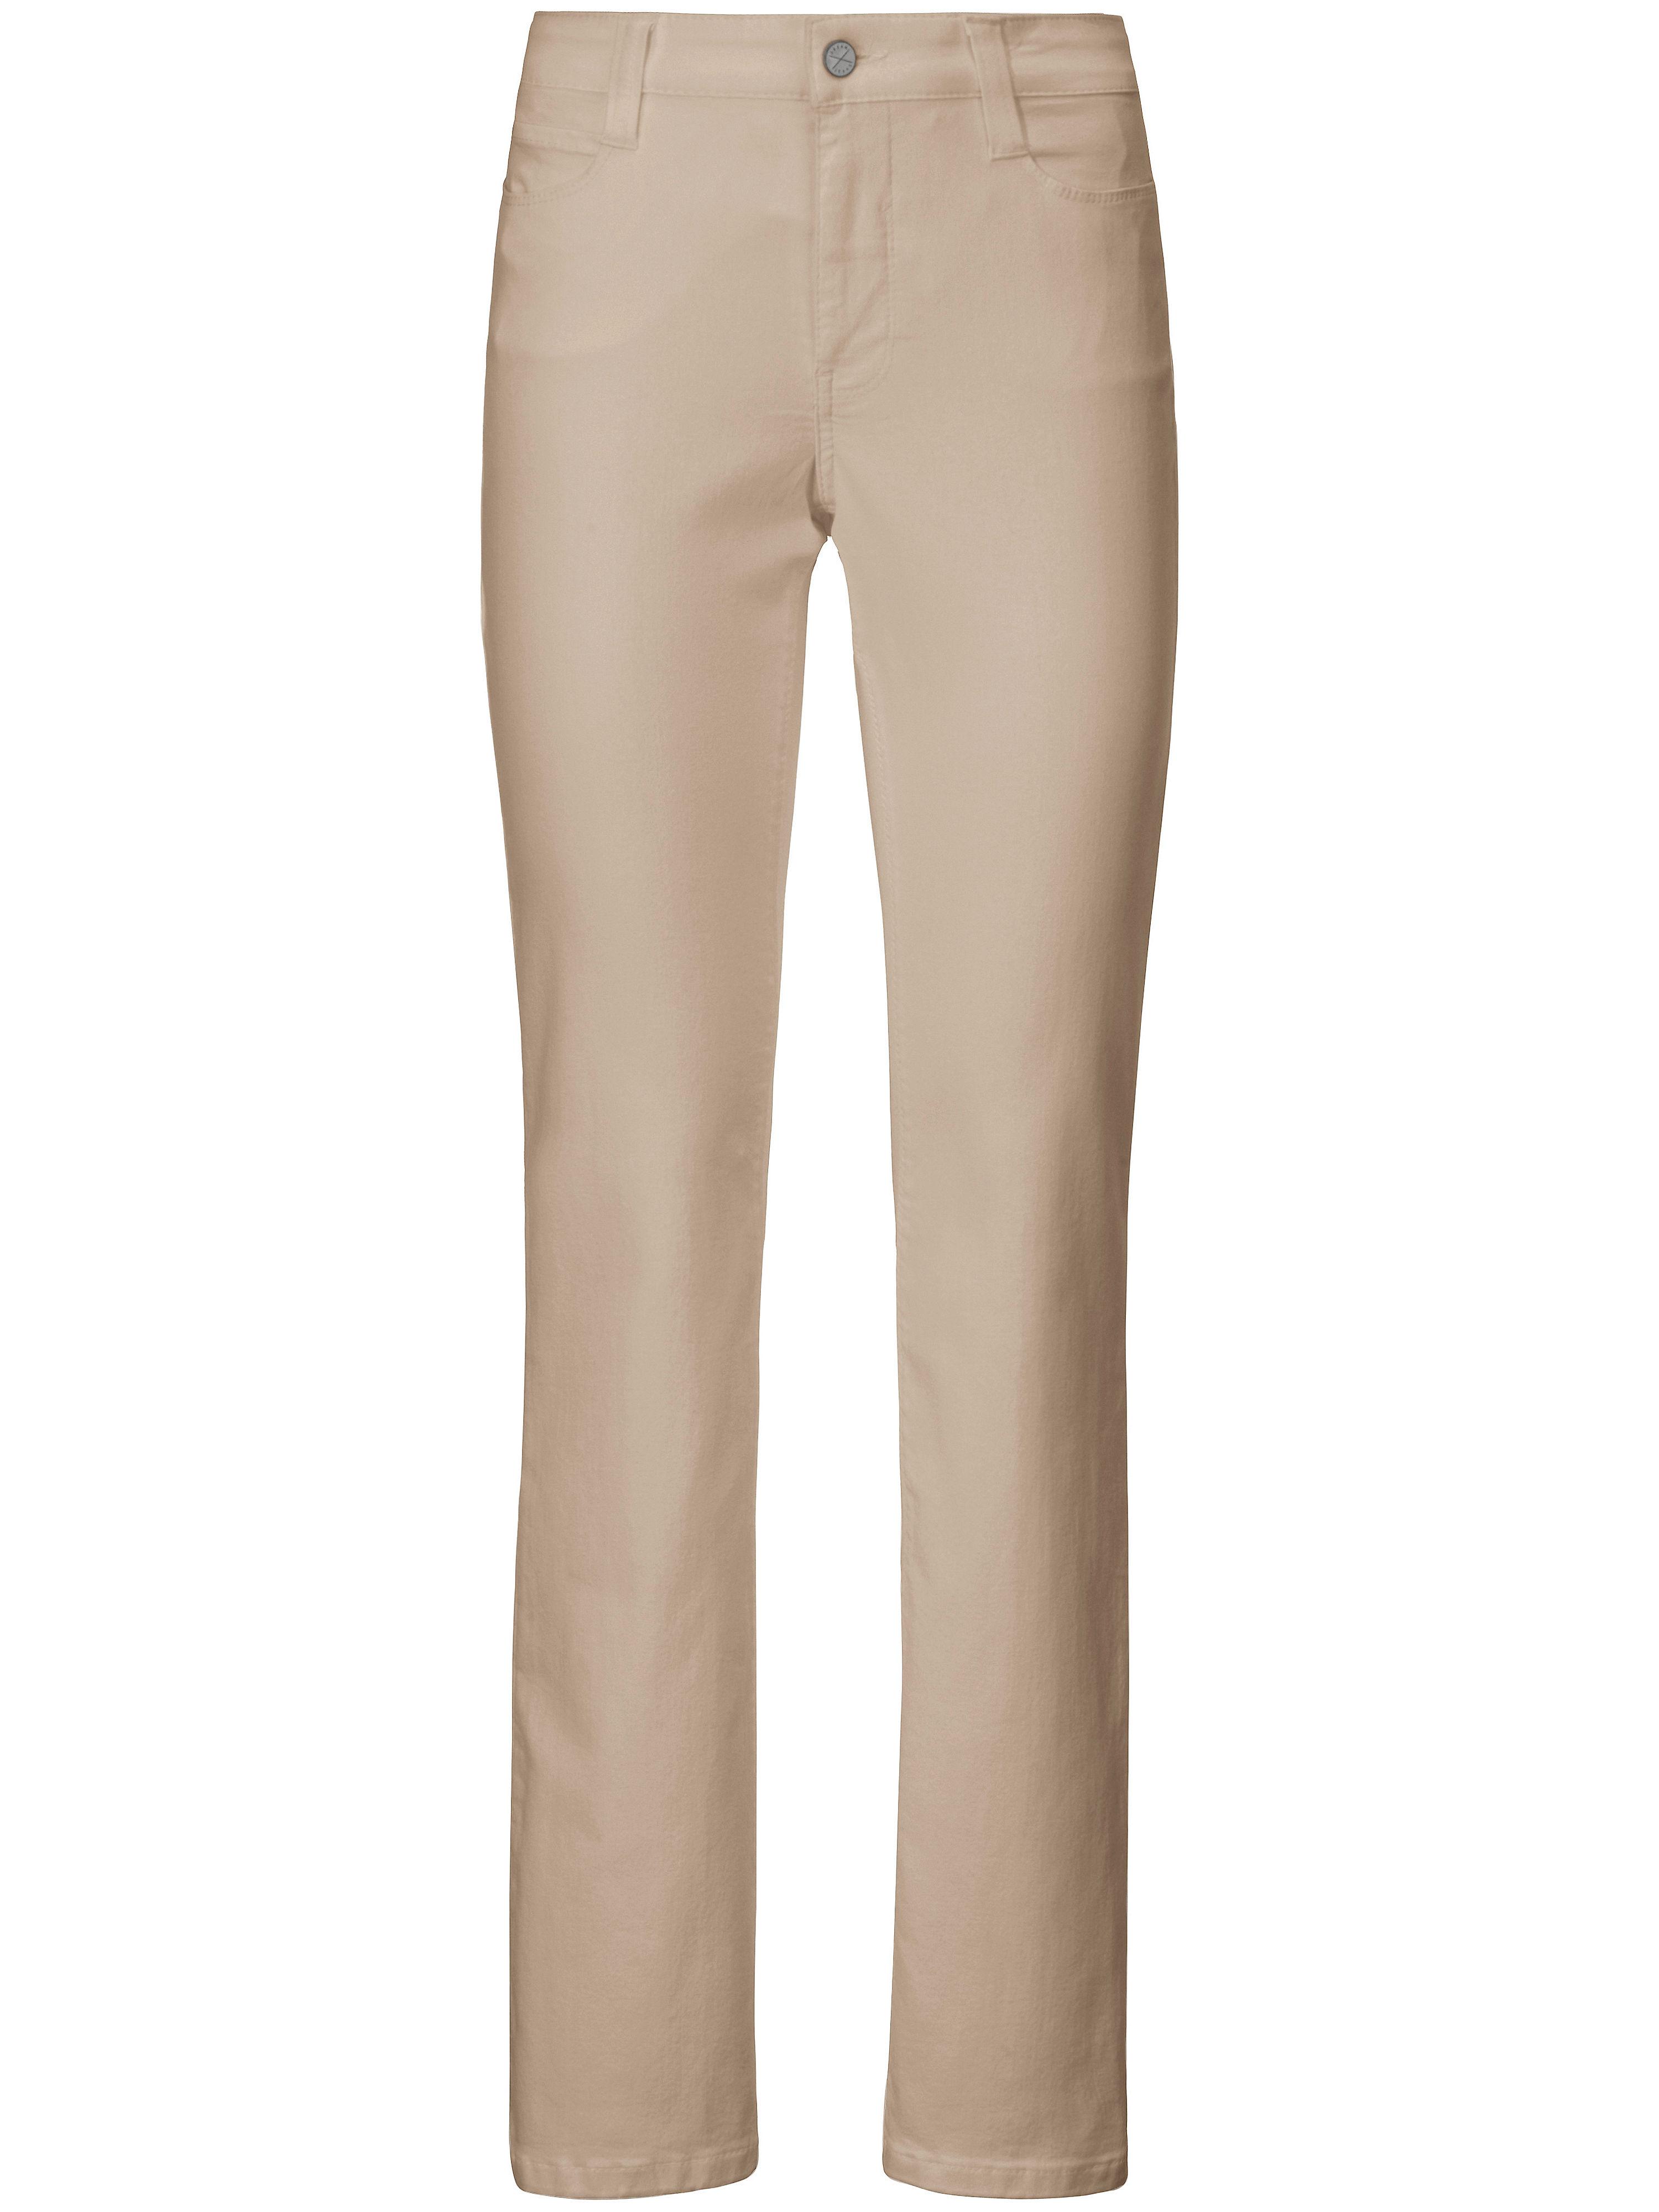 Jeans Modell DREAM Inch-Länge 32 Mac denim